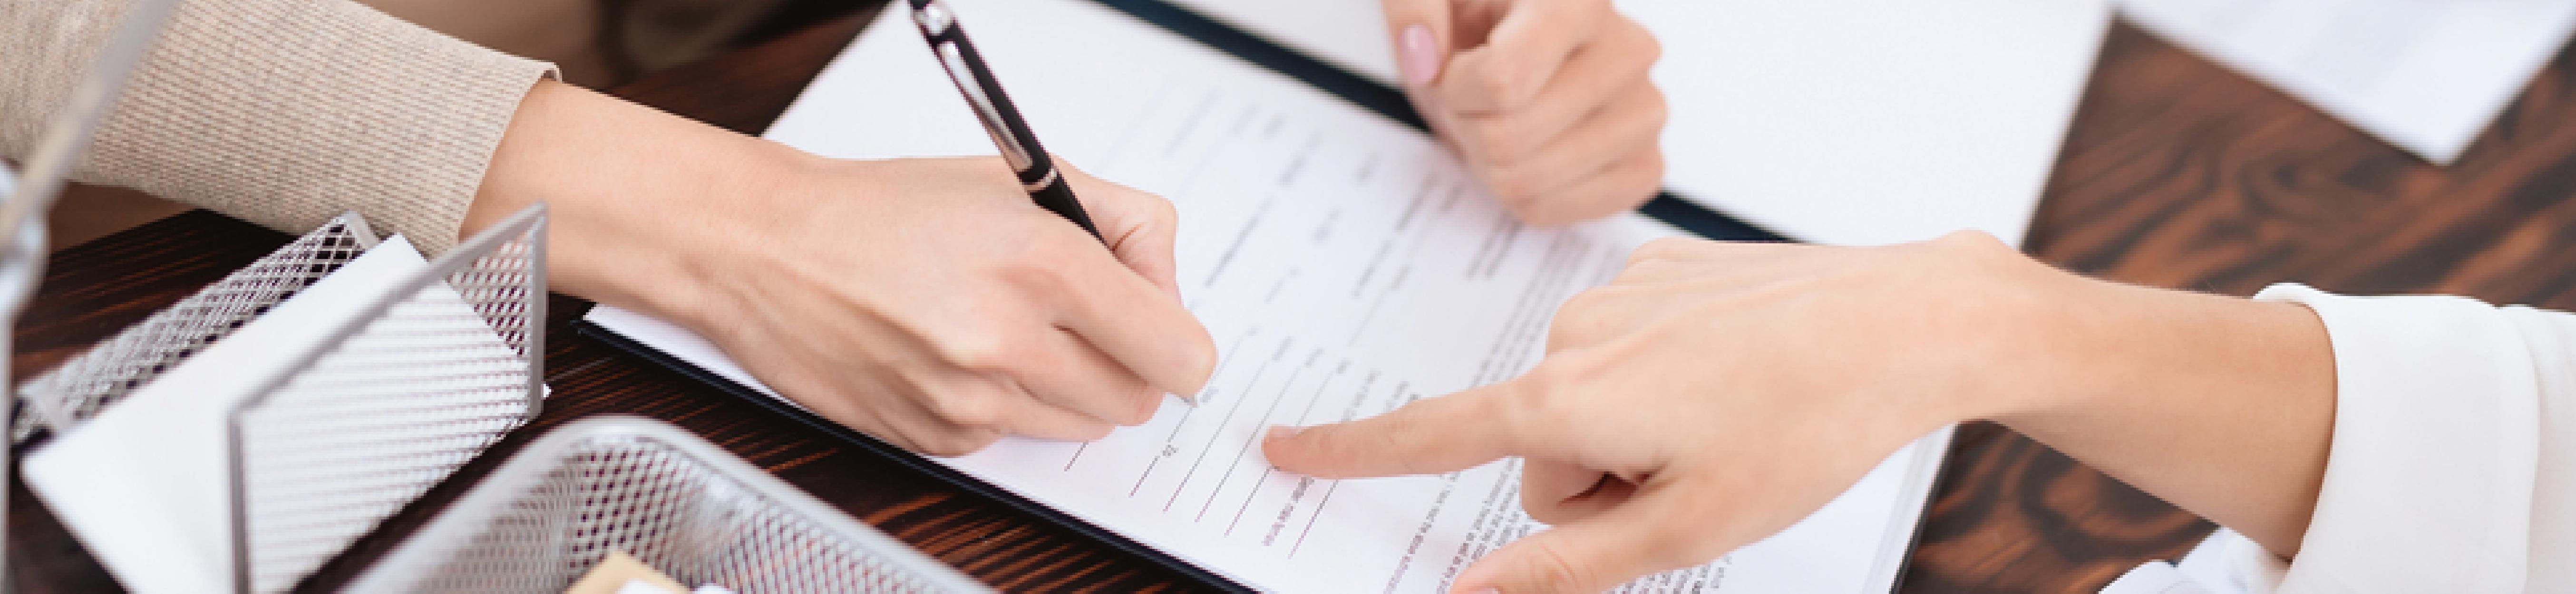 signing-palimony-agreement